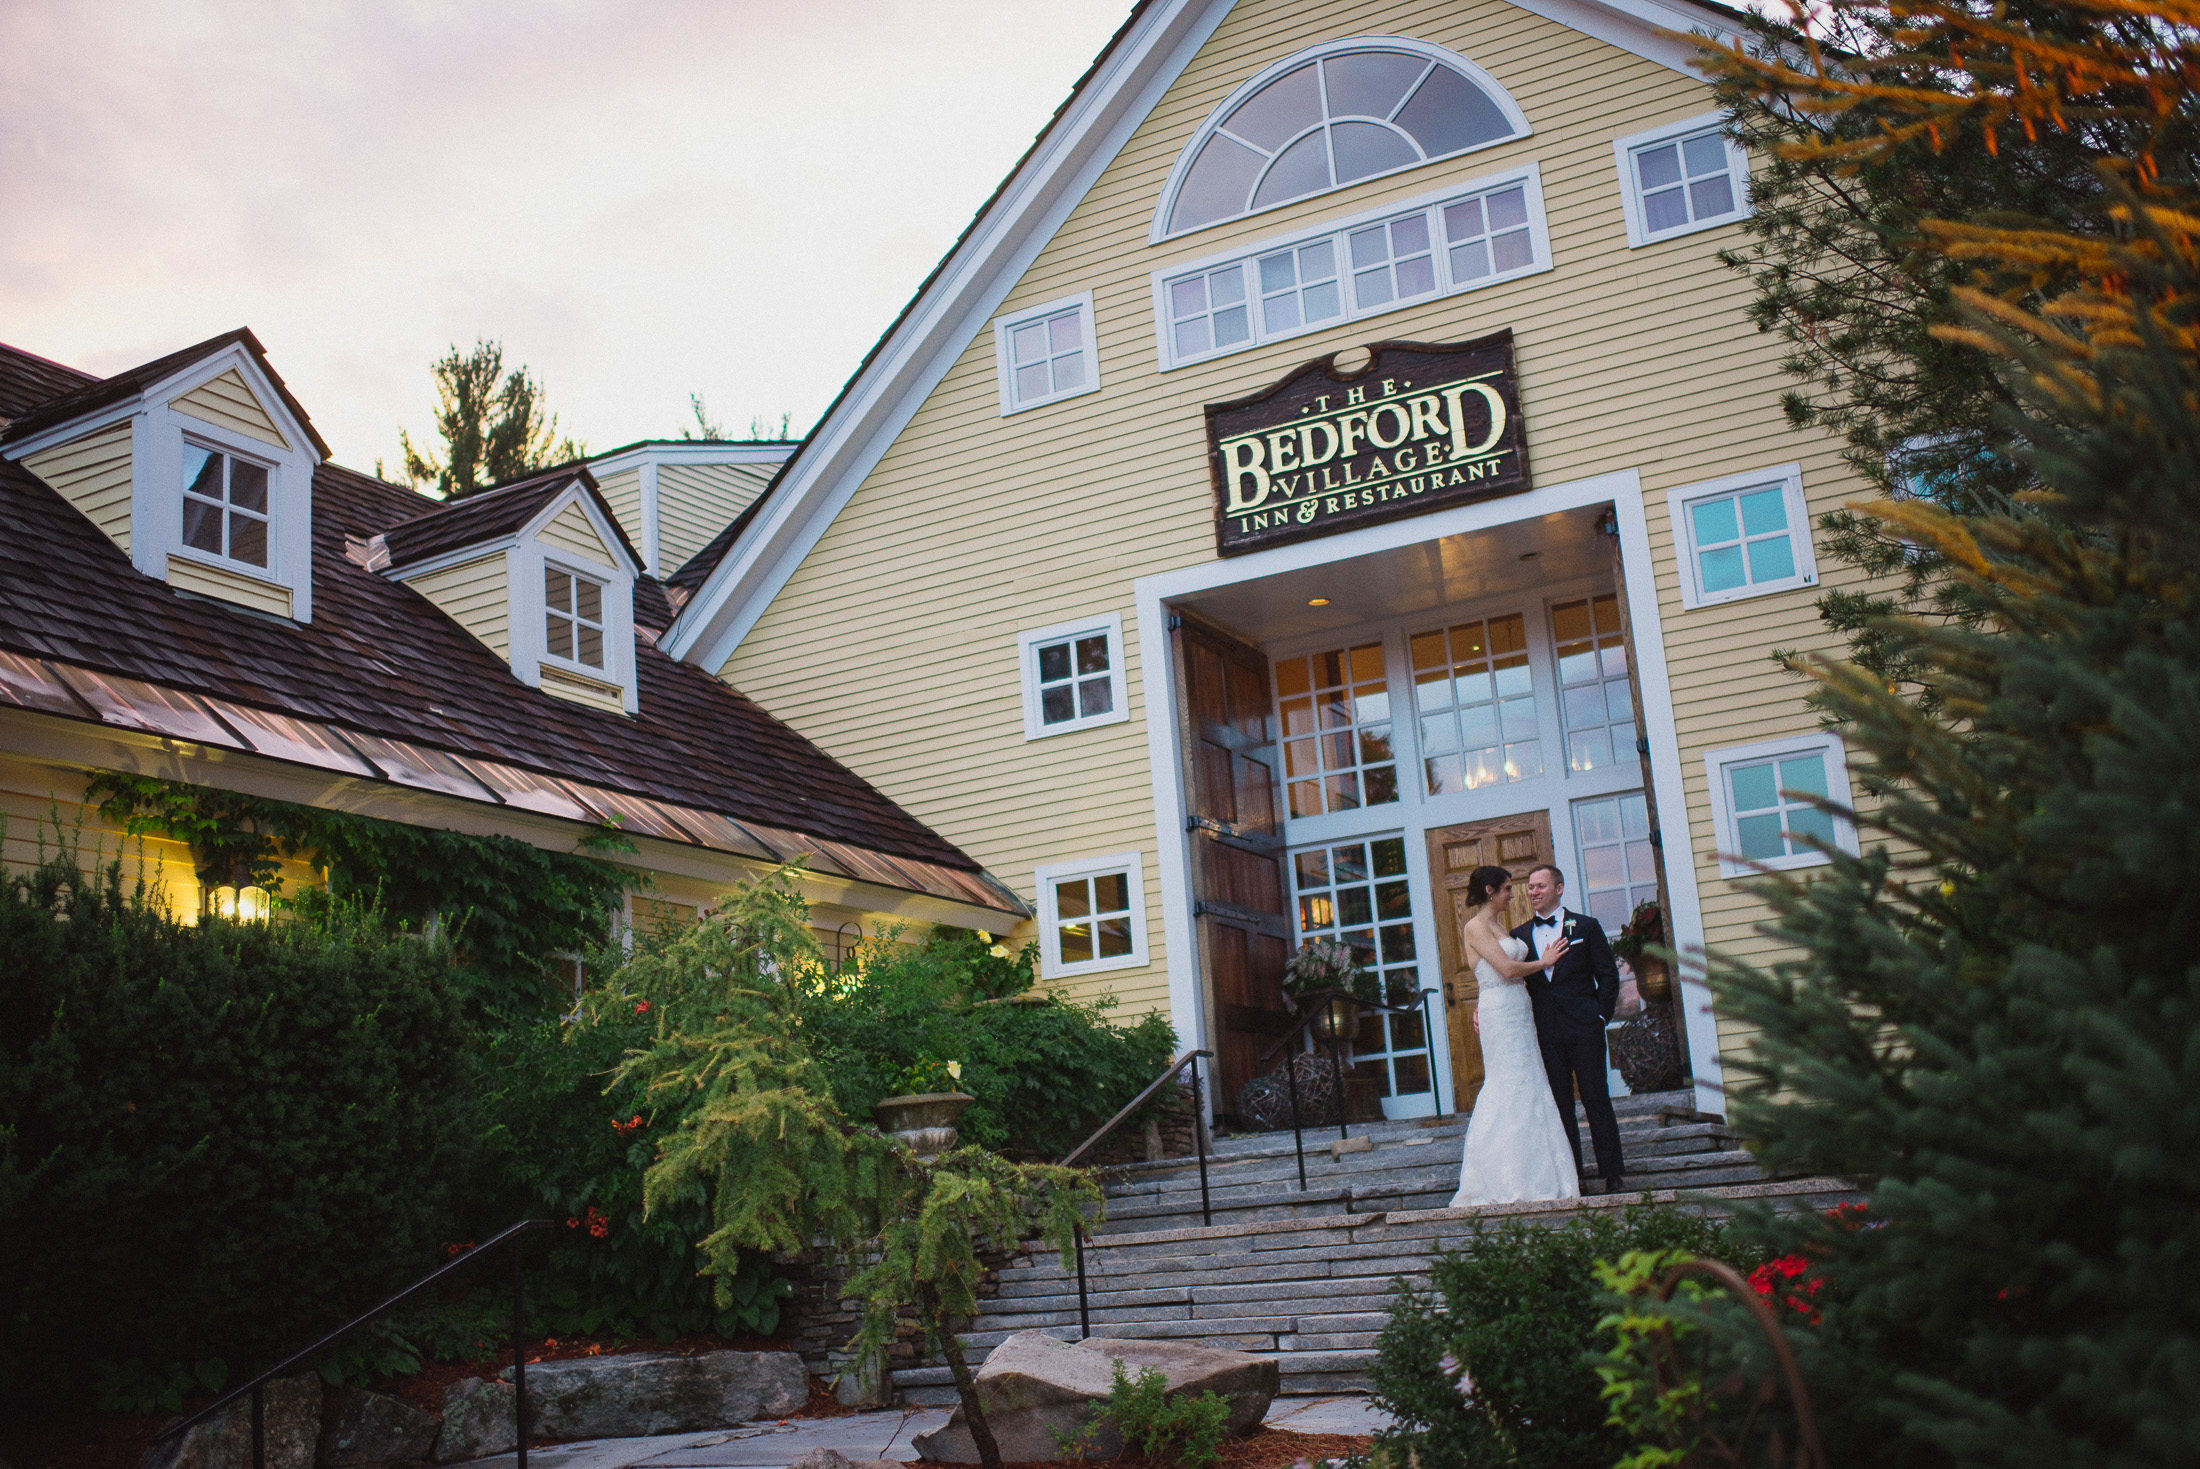 NH Wedding Photographer: on steps of BVI